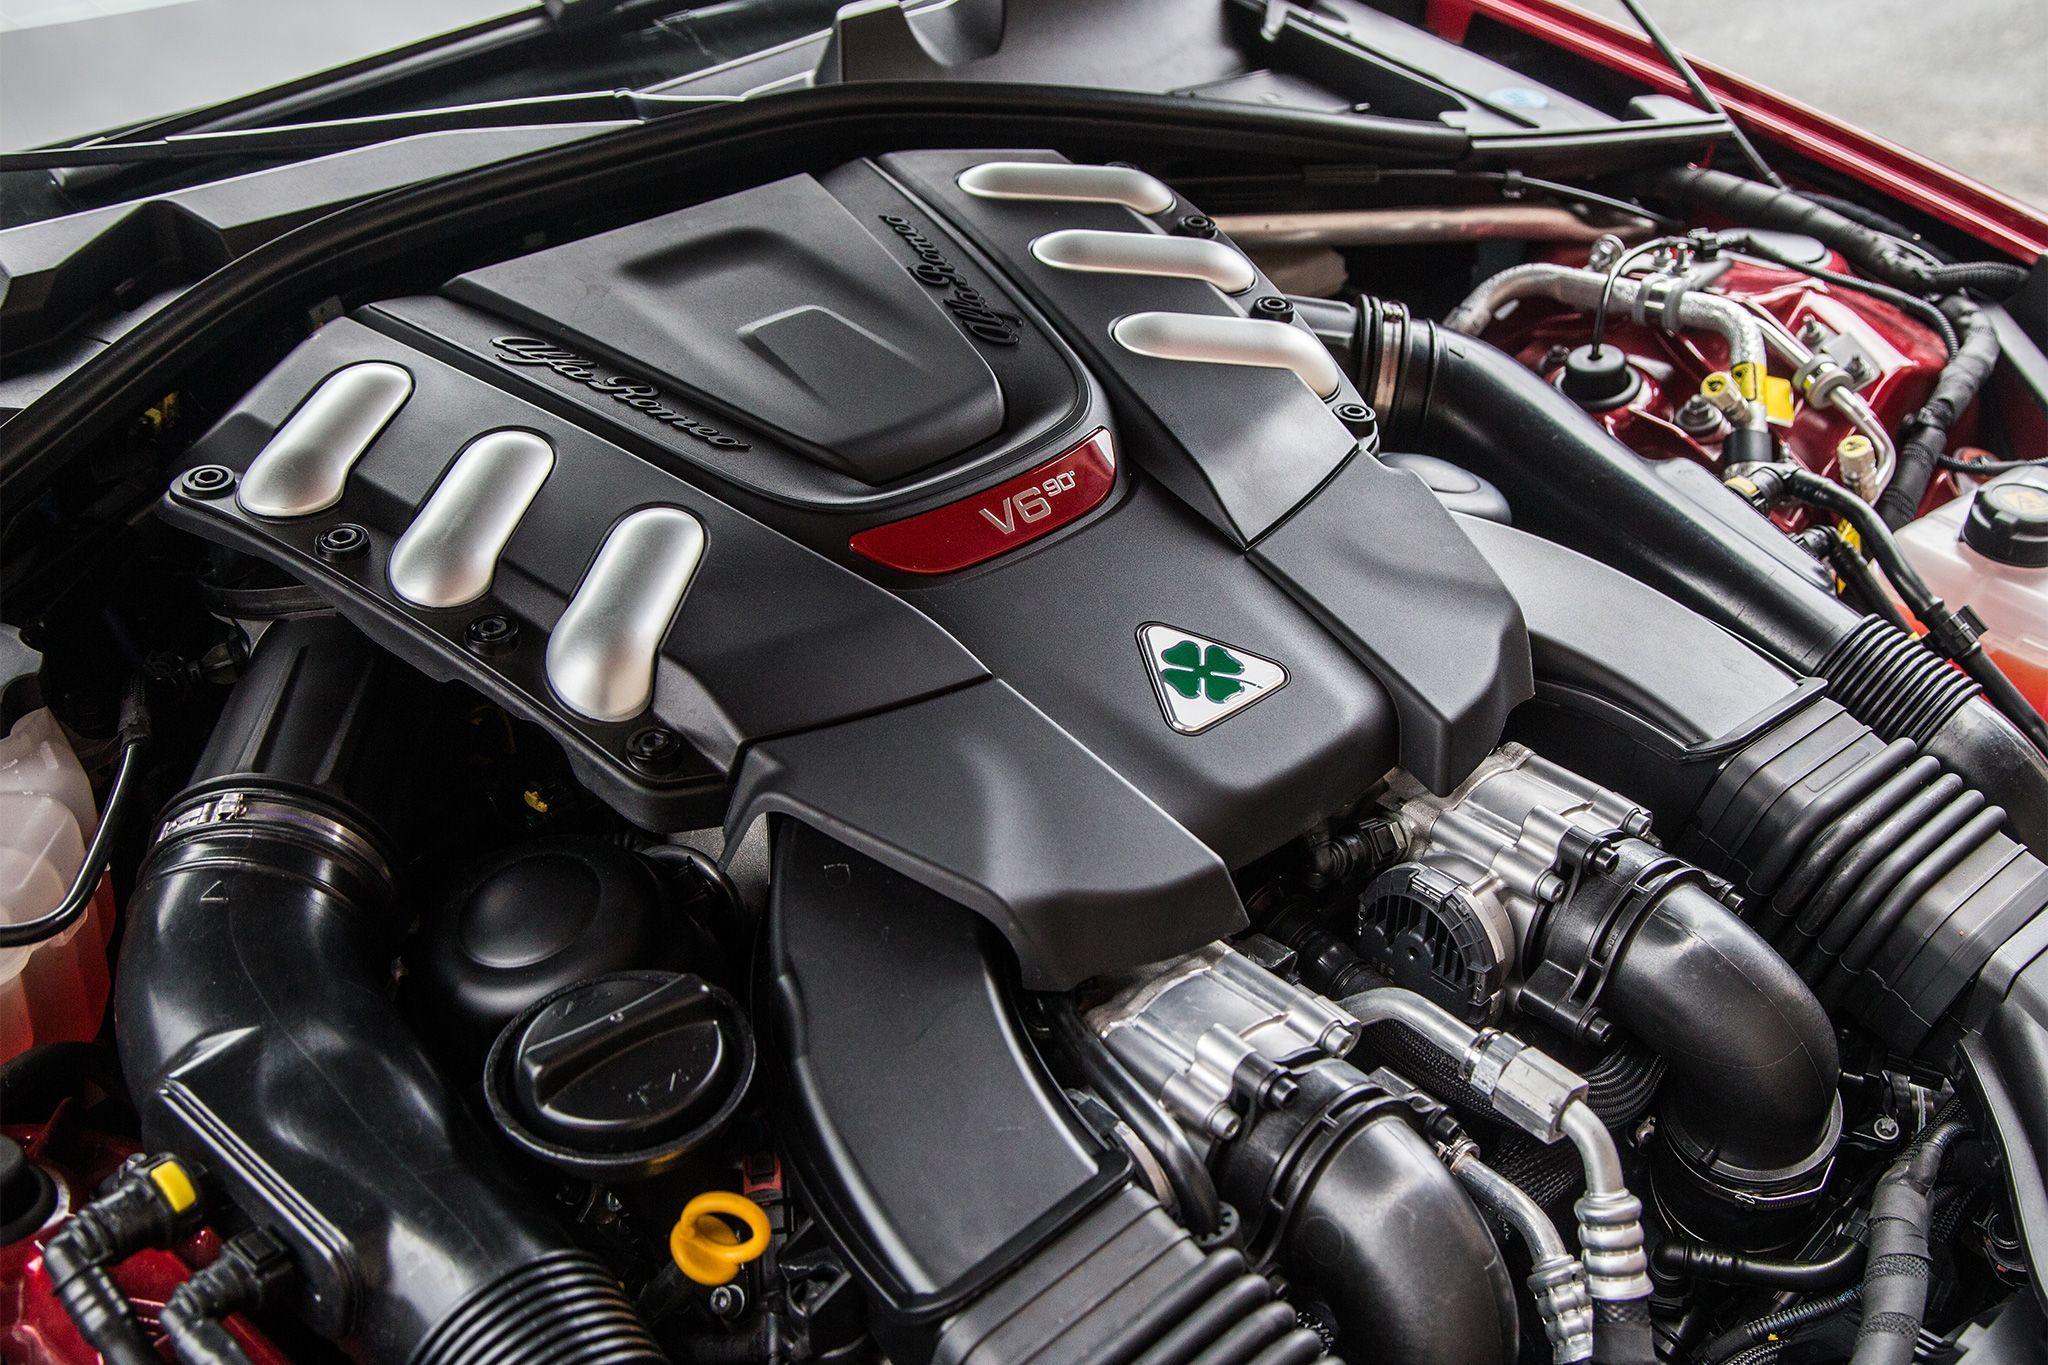 2017 alfa romeo giulia quadrifoglio engine detail v6 bi turbo autos alfa romeo cars. Black Bedroom Furniture Sets. Home Design Ideas